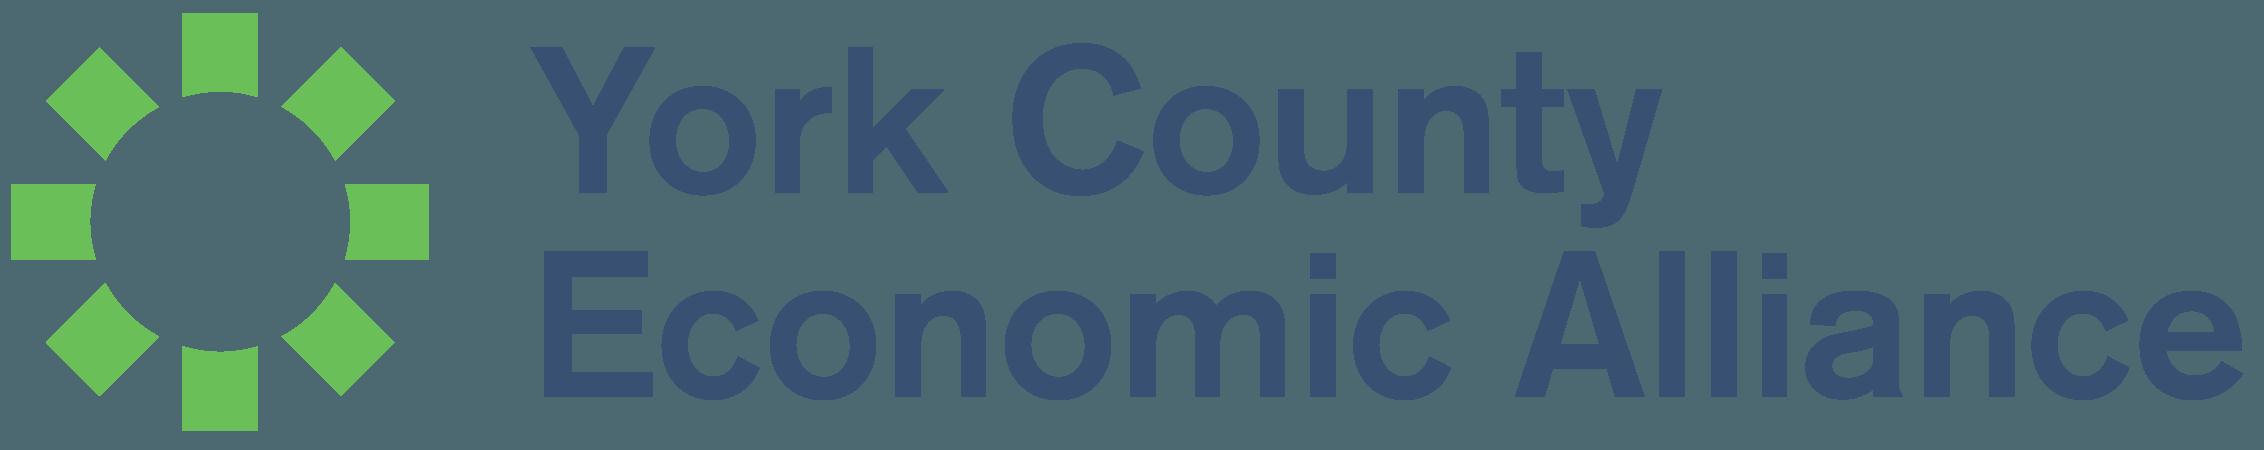 News - York County Economic Alliance